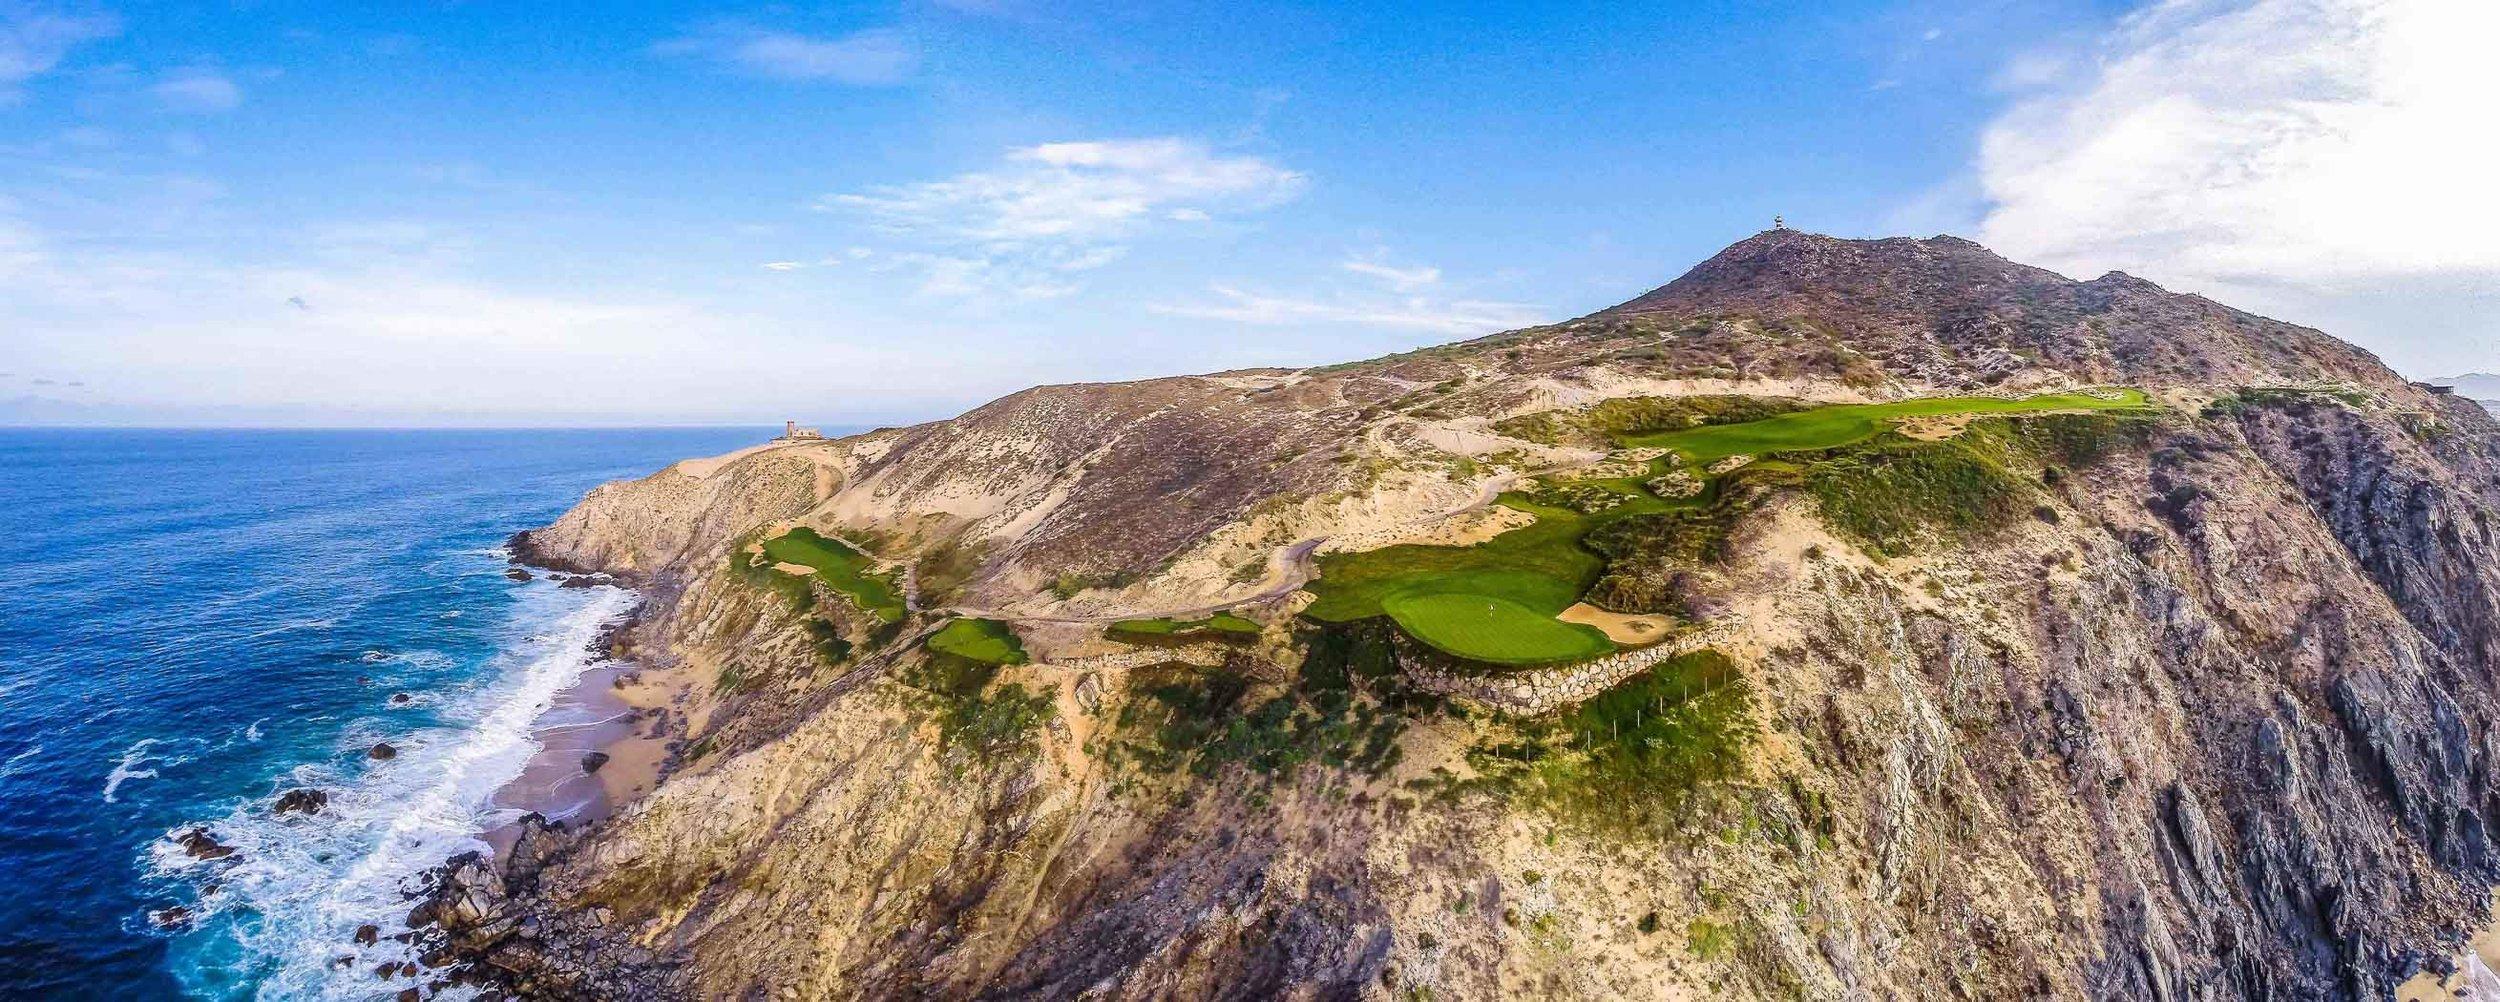 Quivira-Golf-Gallery-1-58ebeb57ada0b-2.jpg